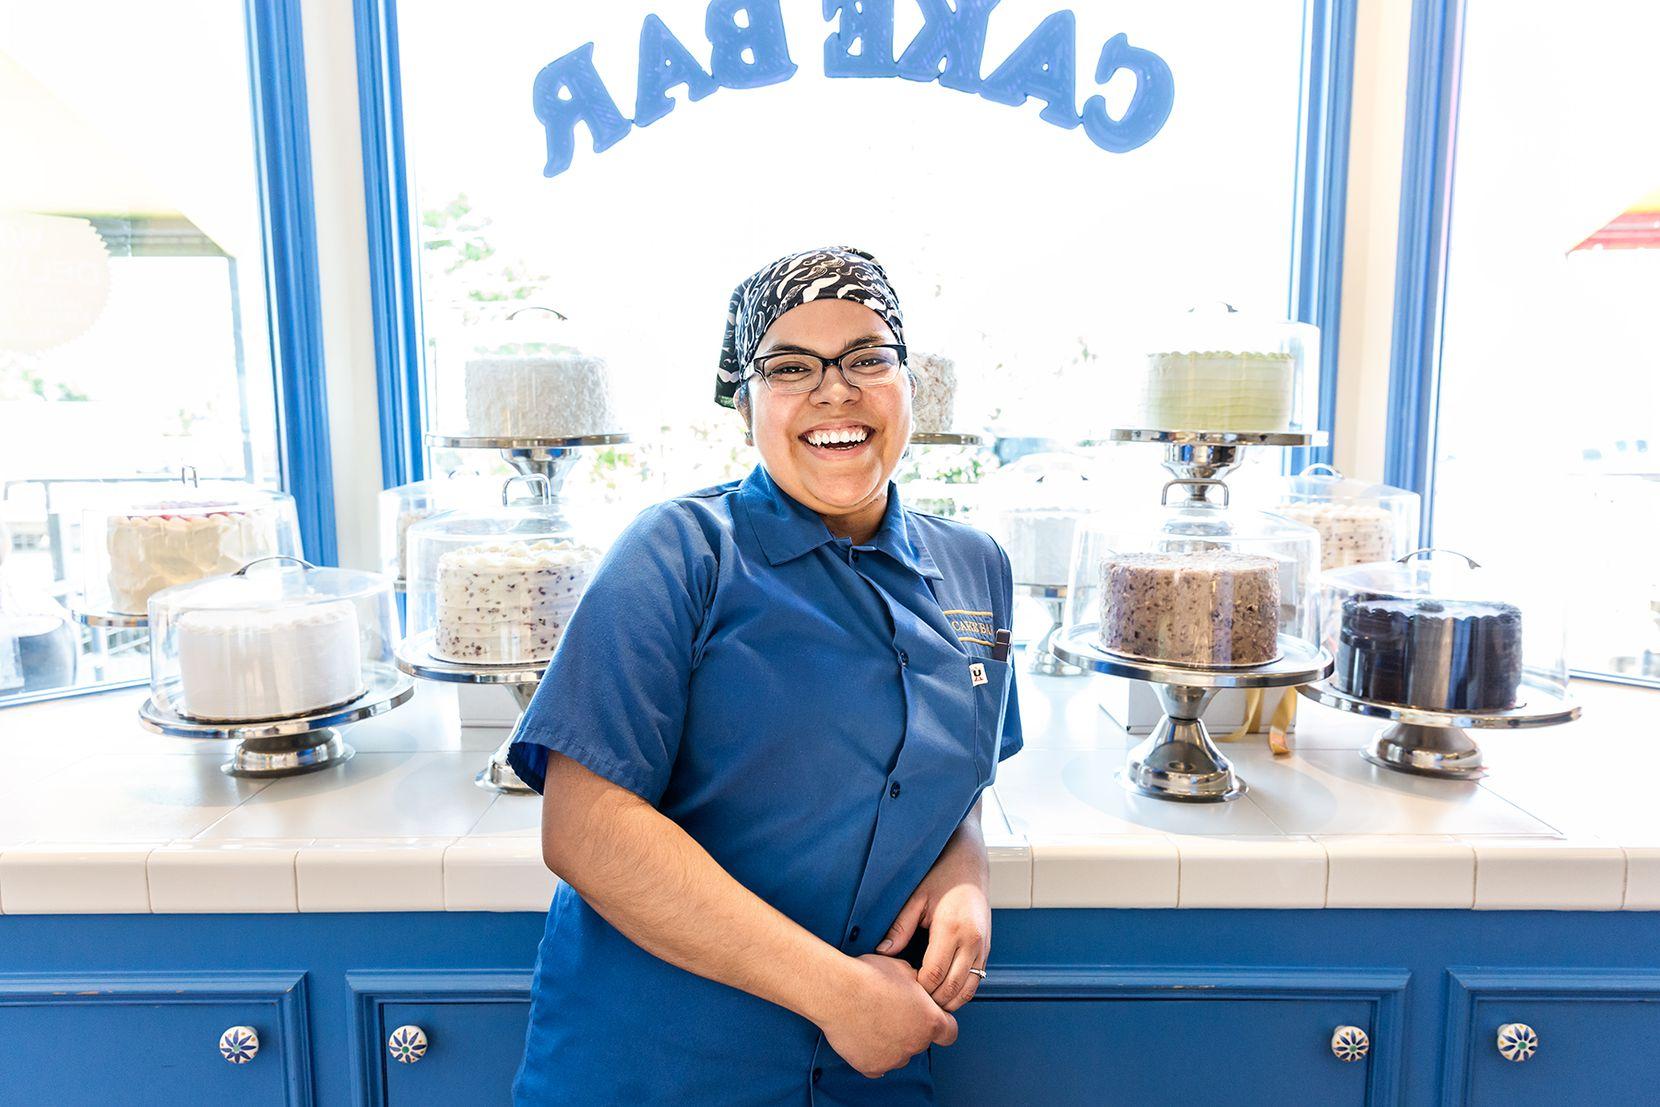 Abigail de Jesus, 27, cake decorator at Cake Bar